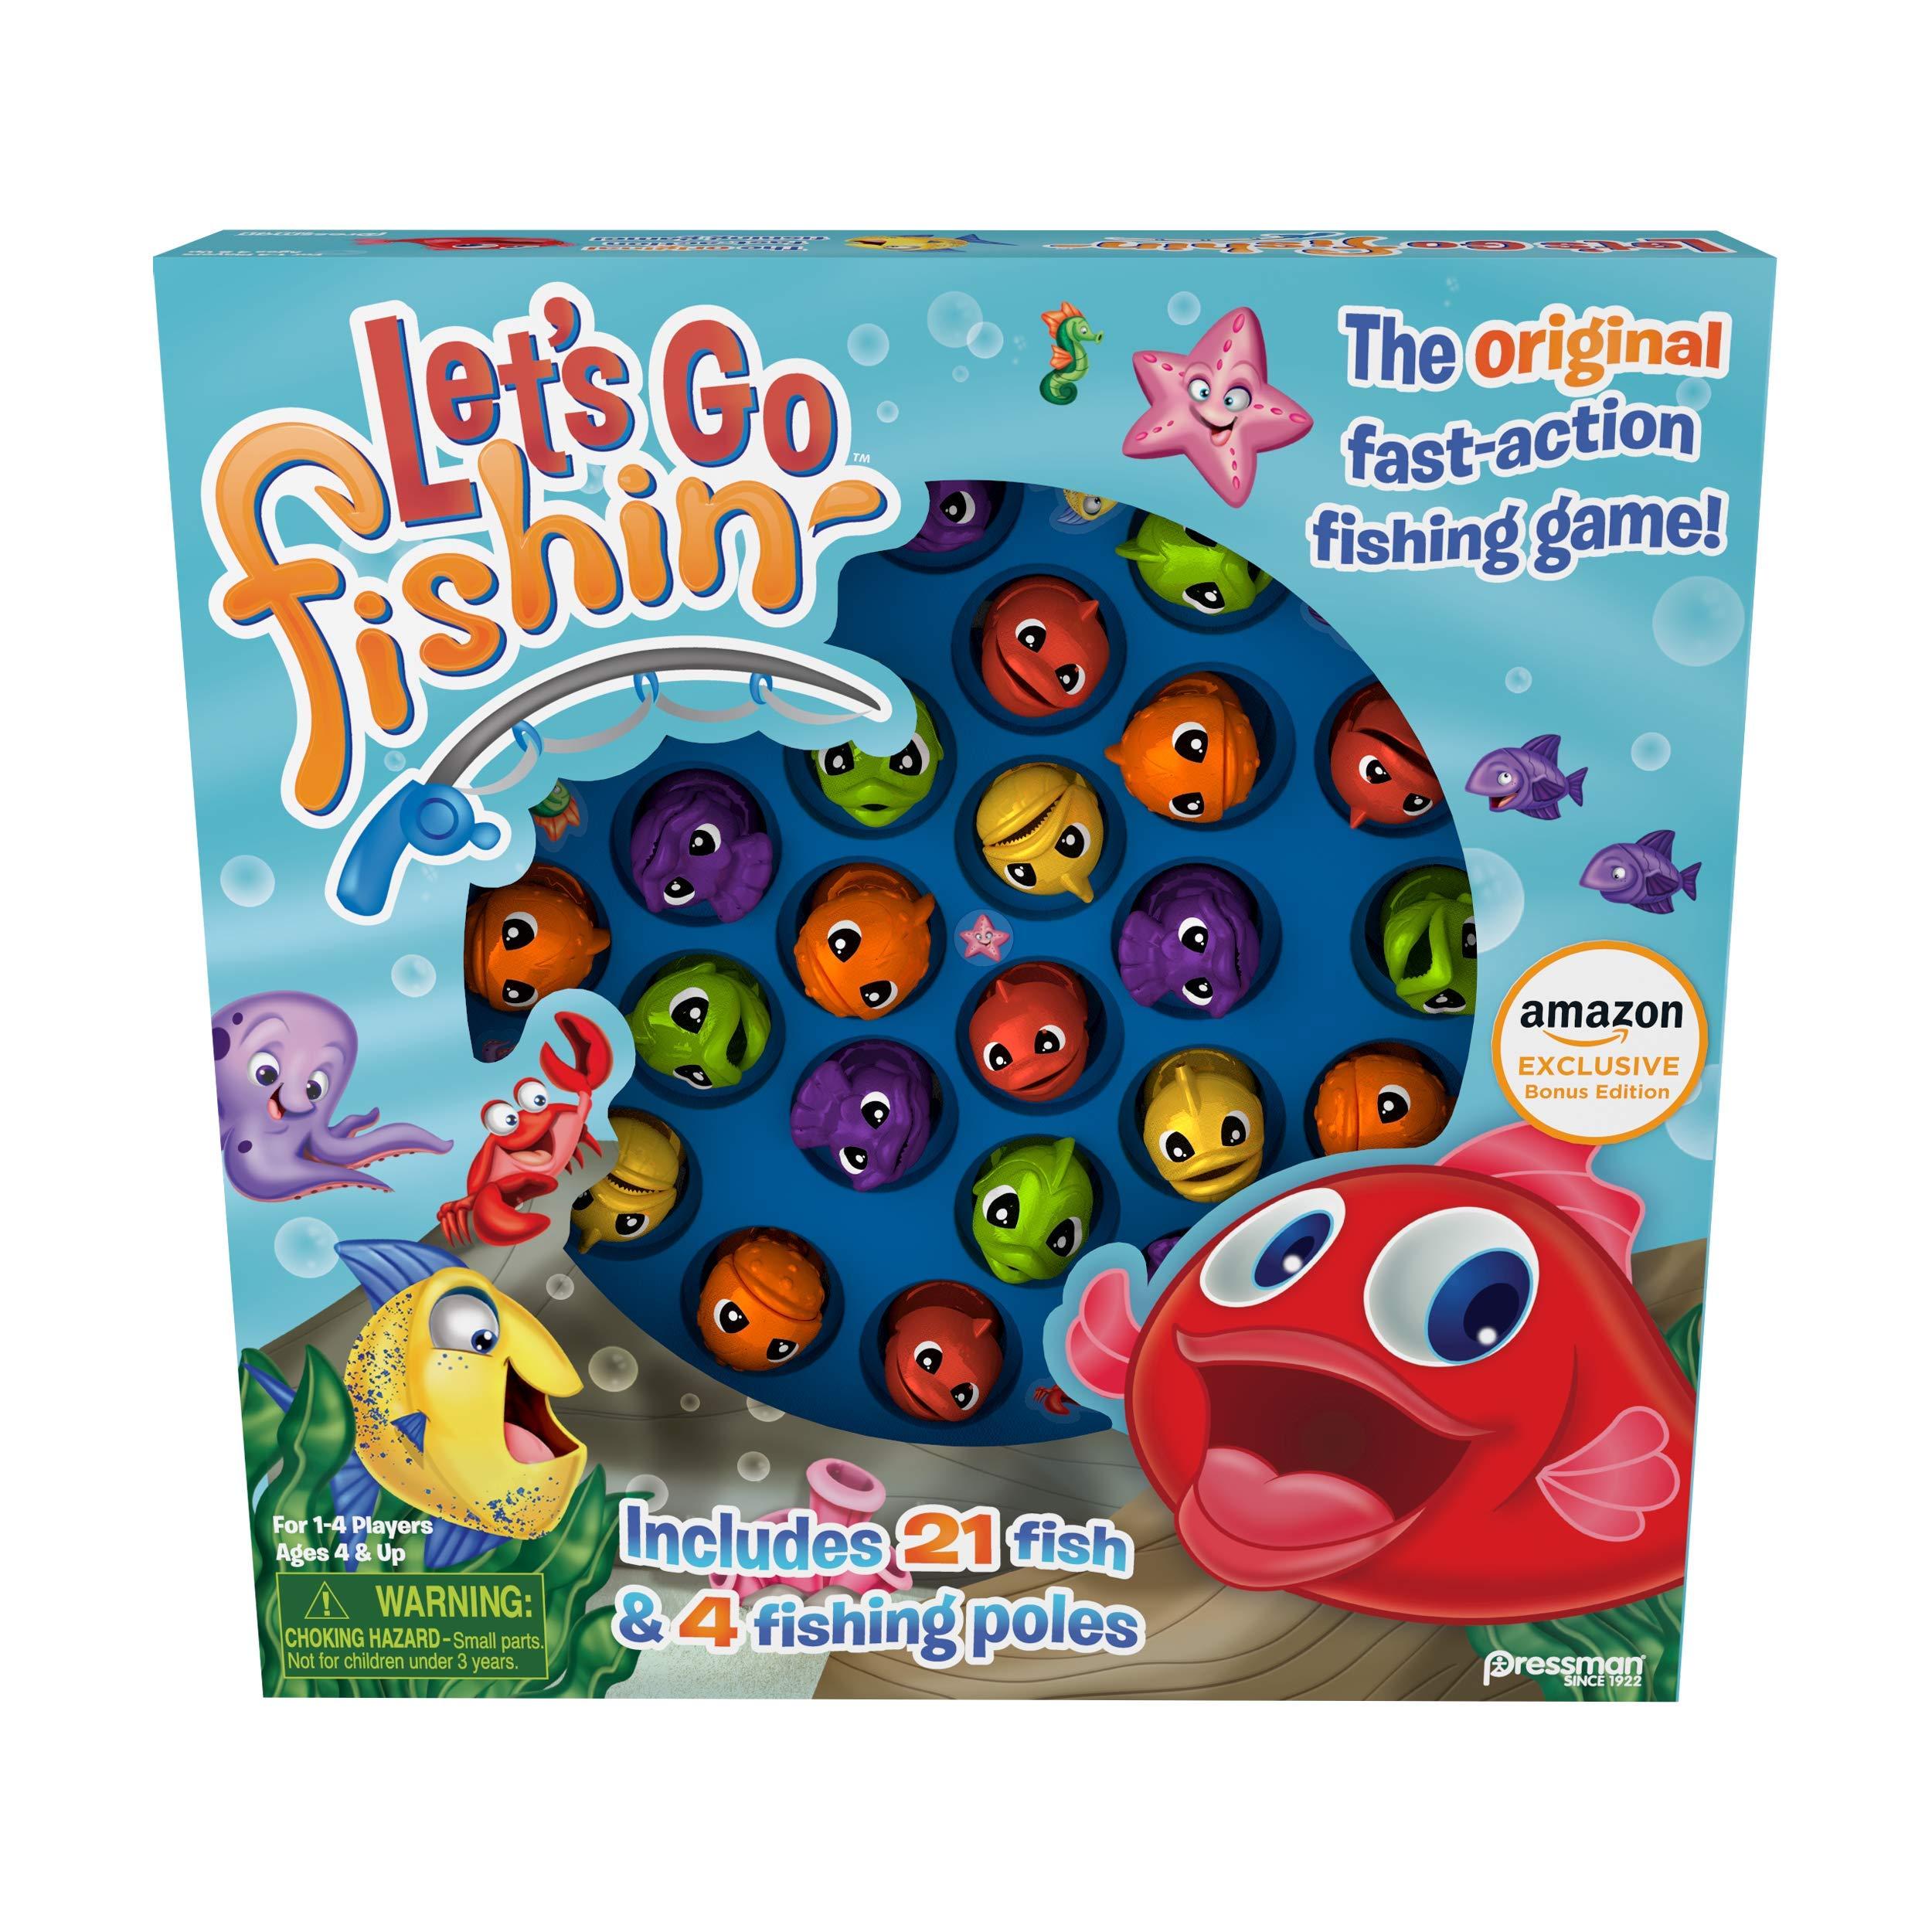 Pressman Amazon Exclusive Bonus Edition Let's Go Fishin' - Includes Lucky Ducks Make-A-Match Game!